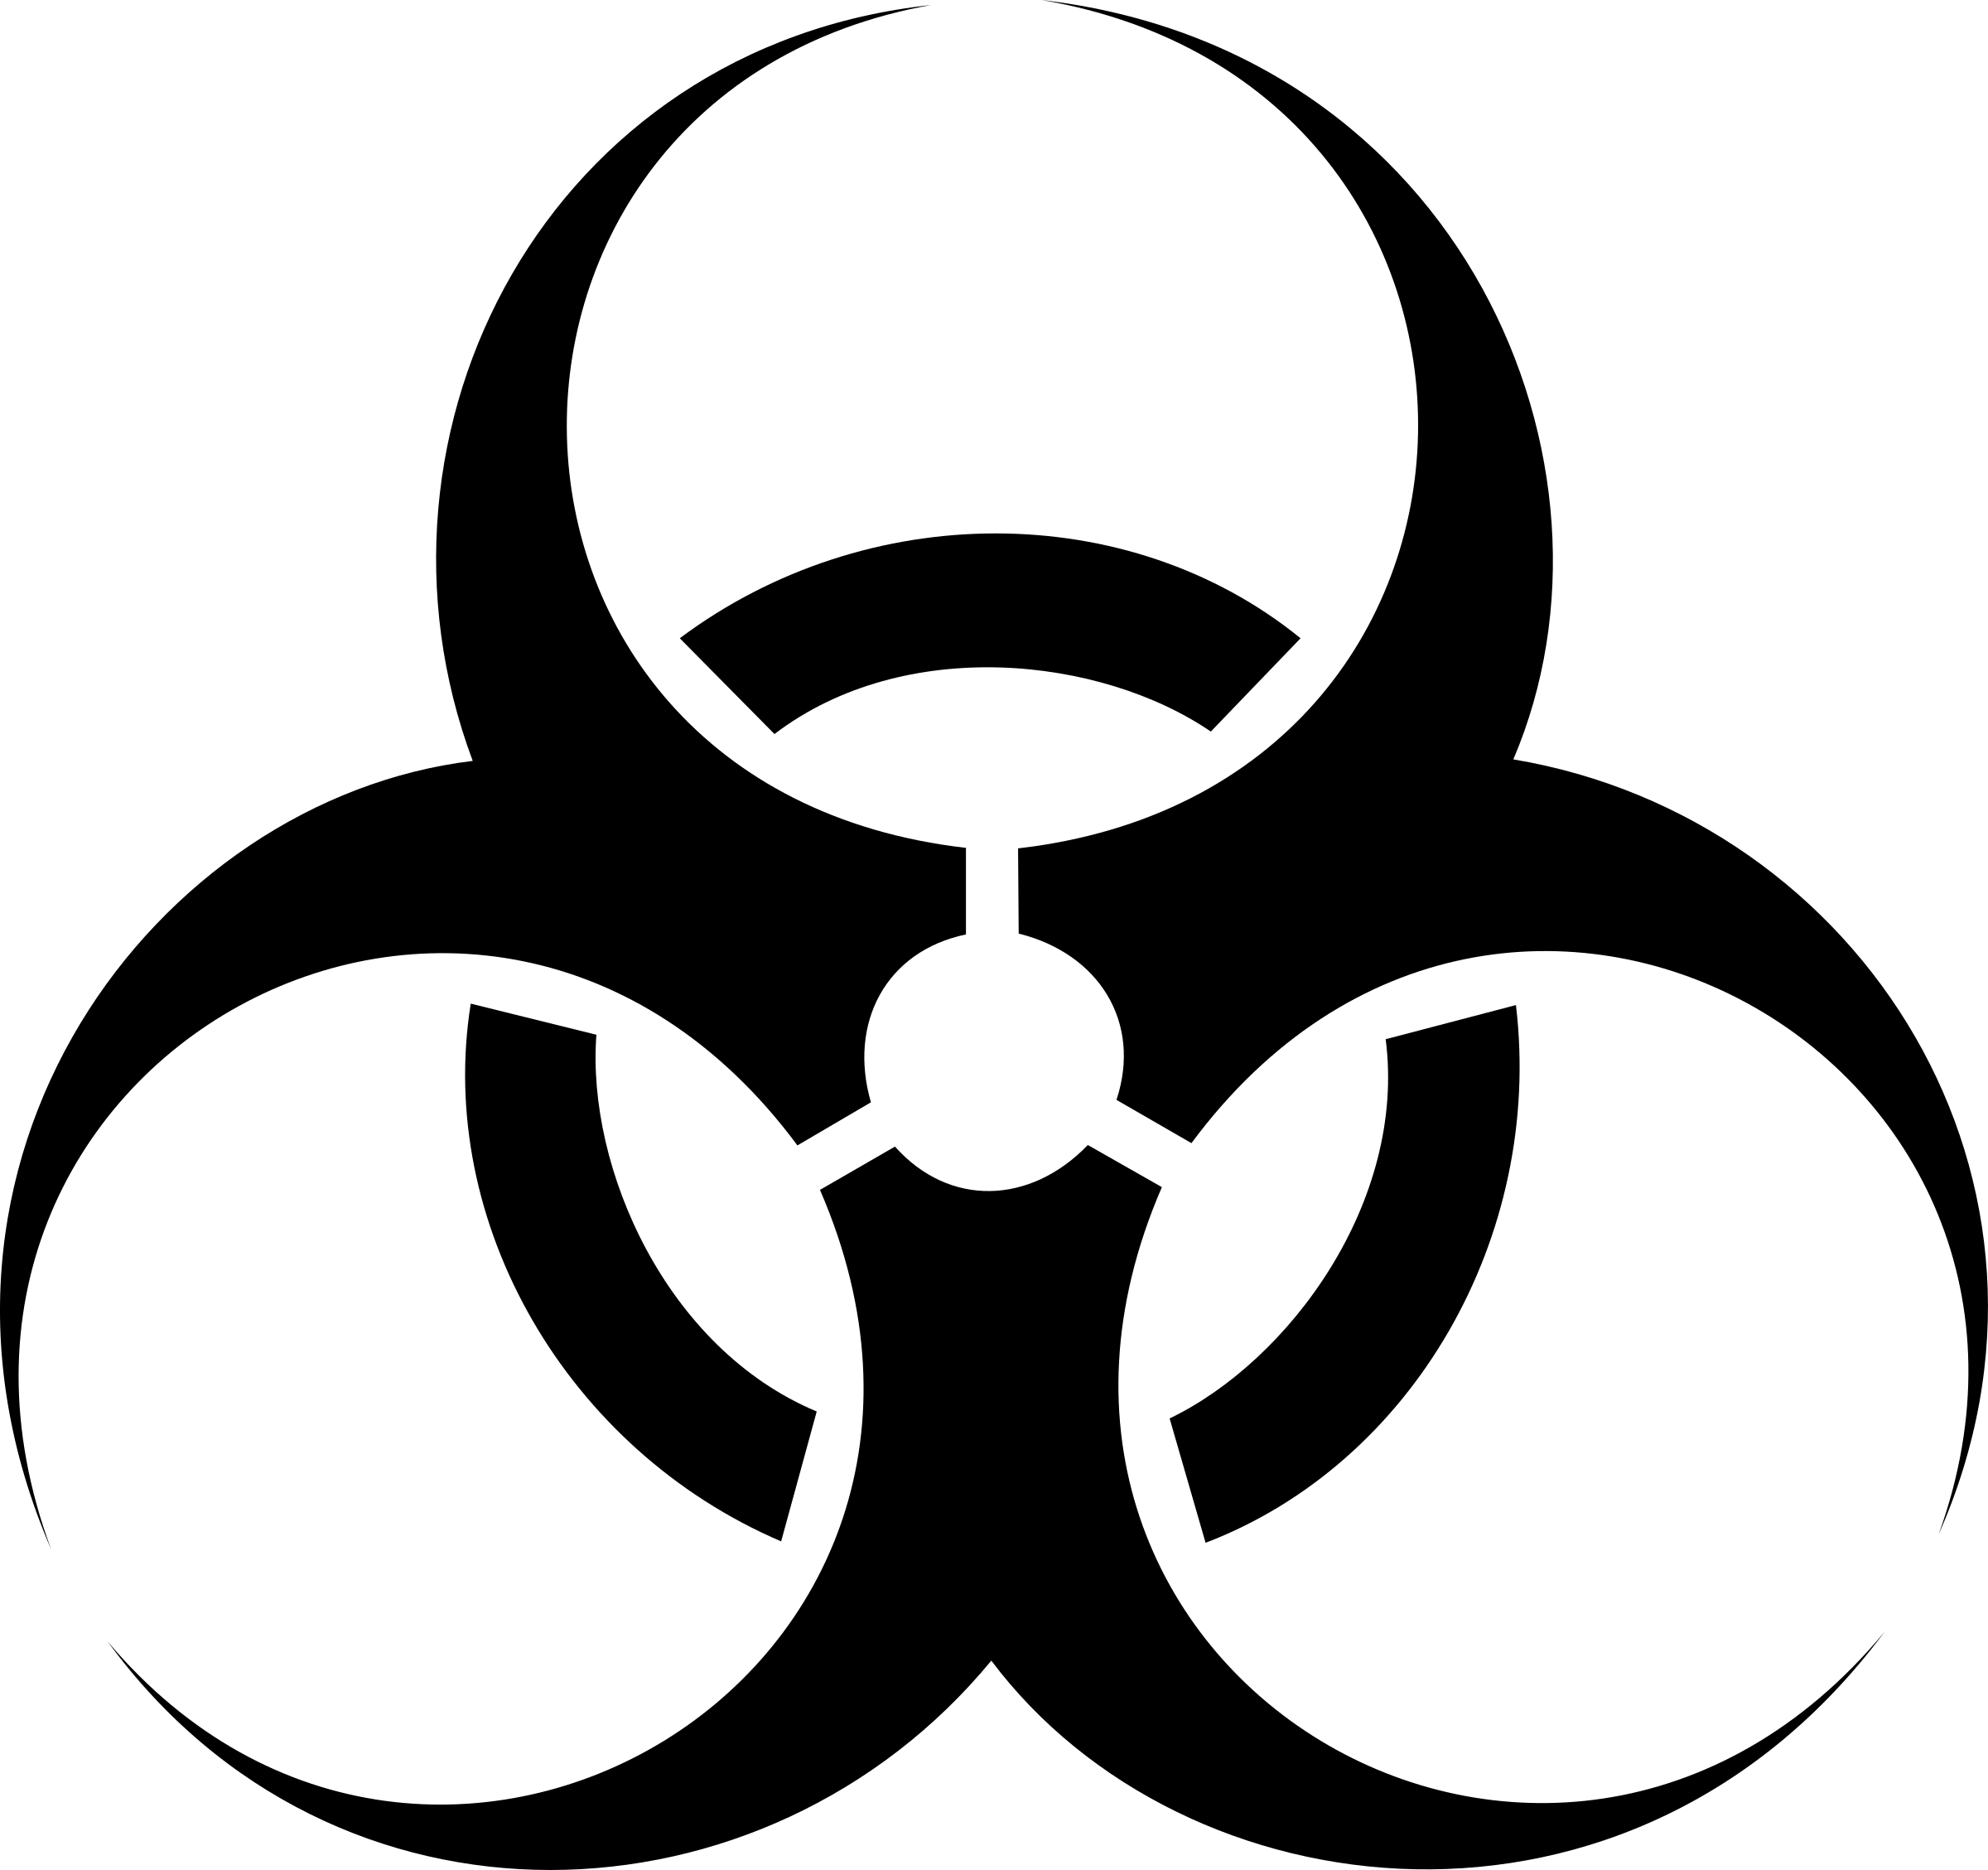 Symbol clipart biohazard Symbol Biohazard Clipart Biohazard symbol